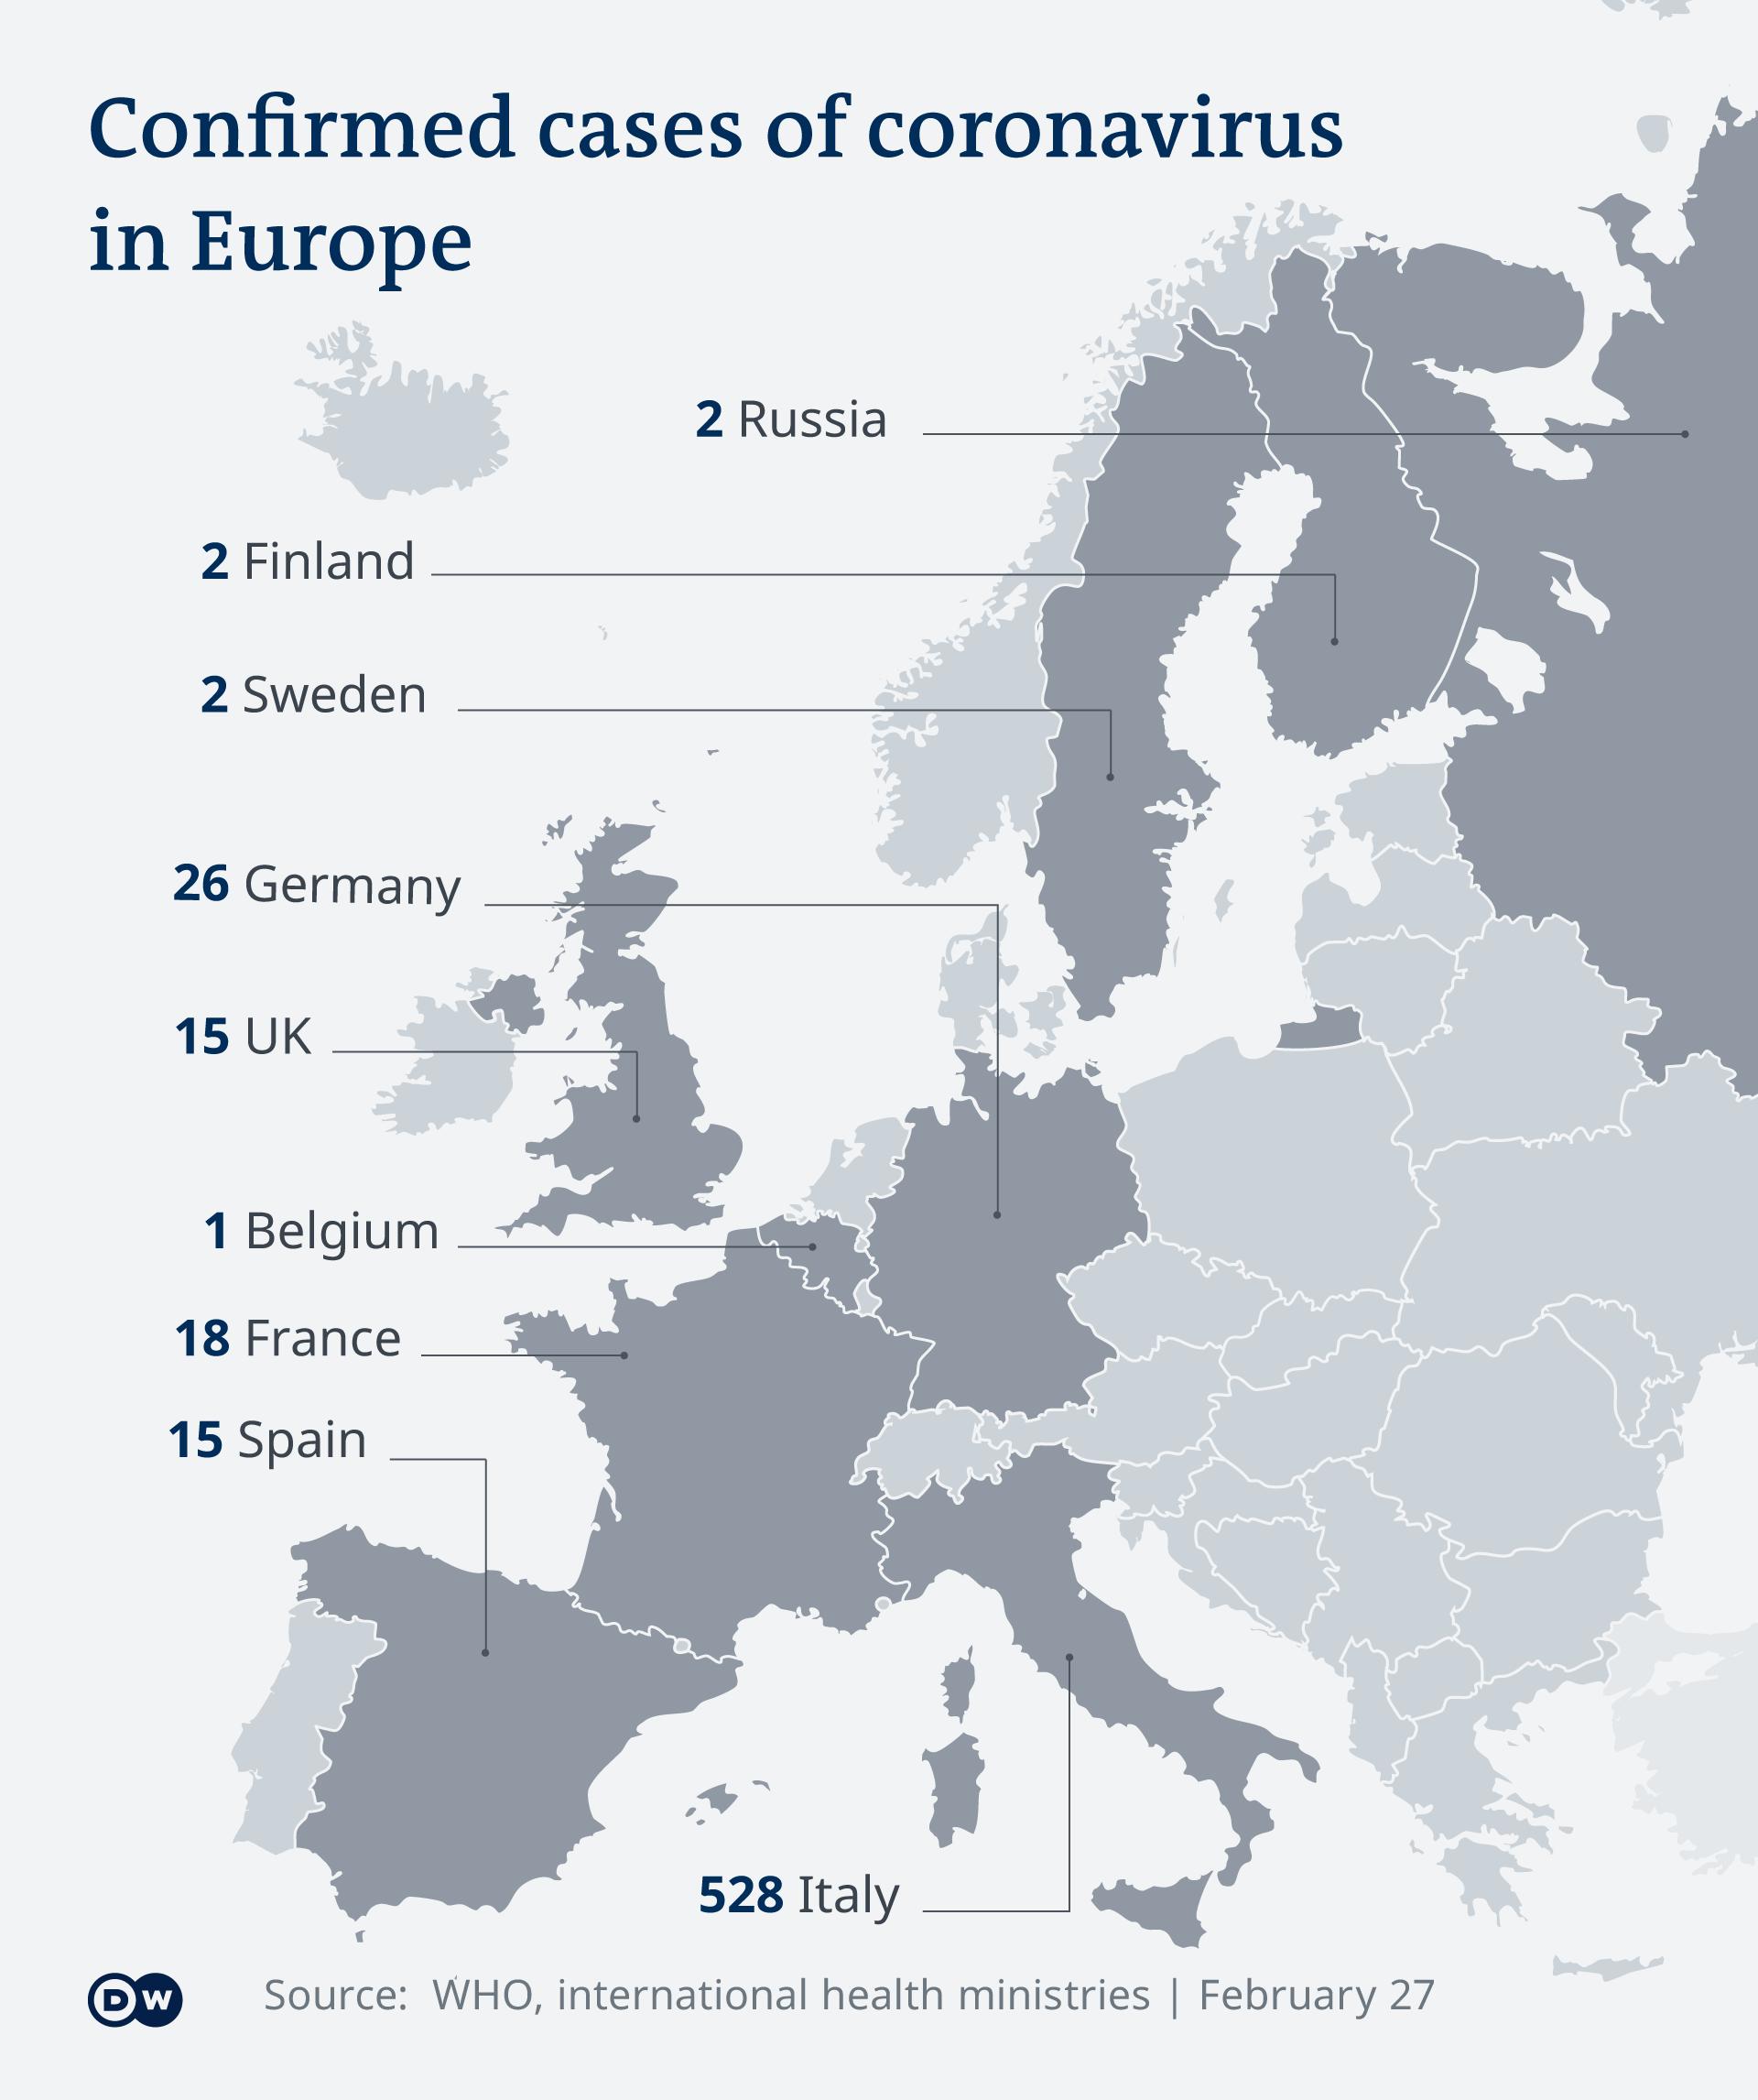 onfirmed cases of coronavirus in Europe